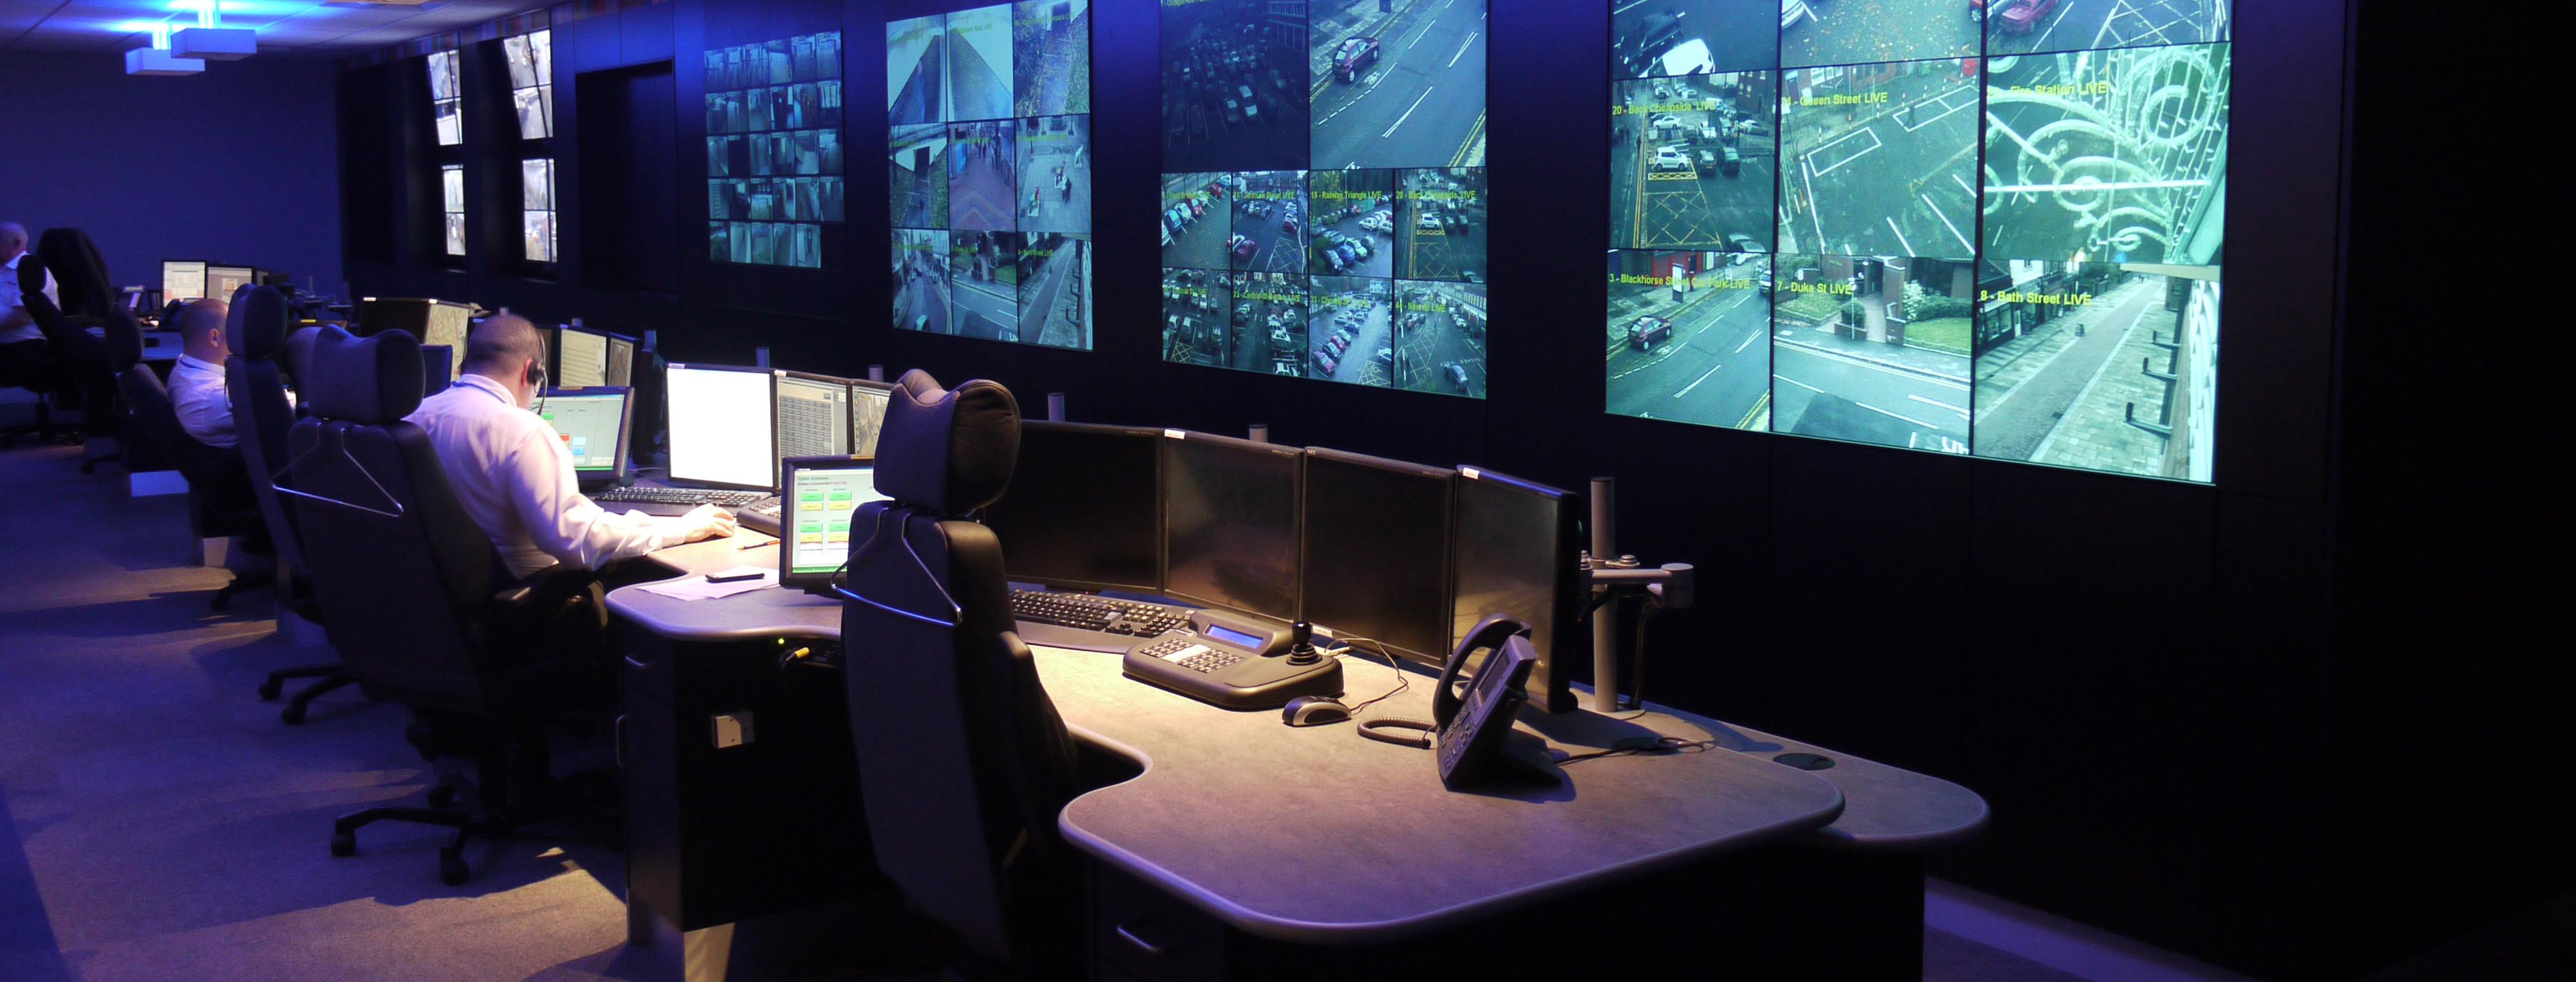 offsite-monitoring-banner